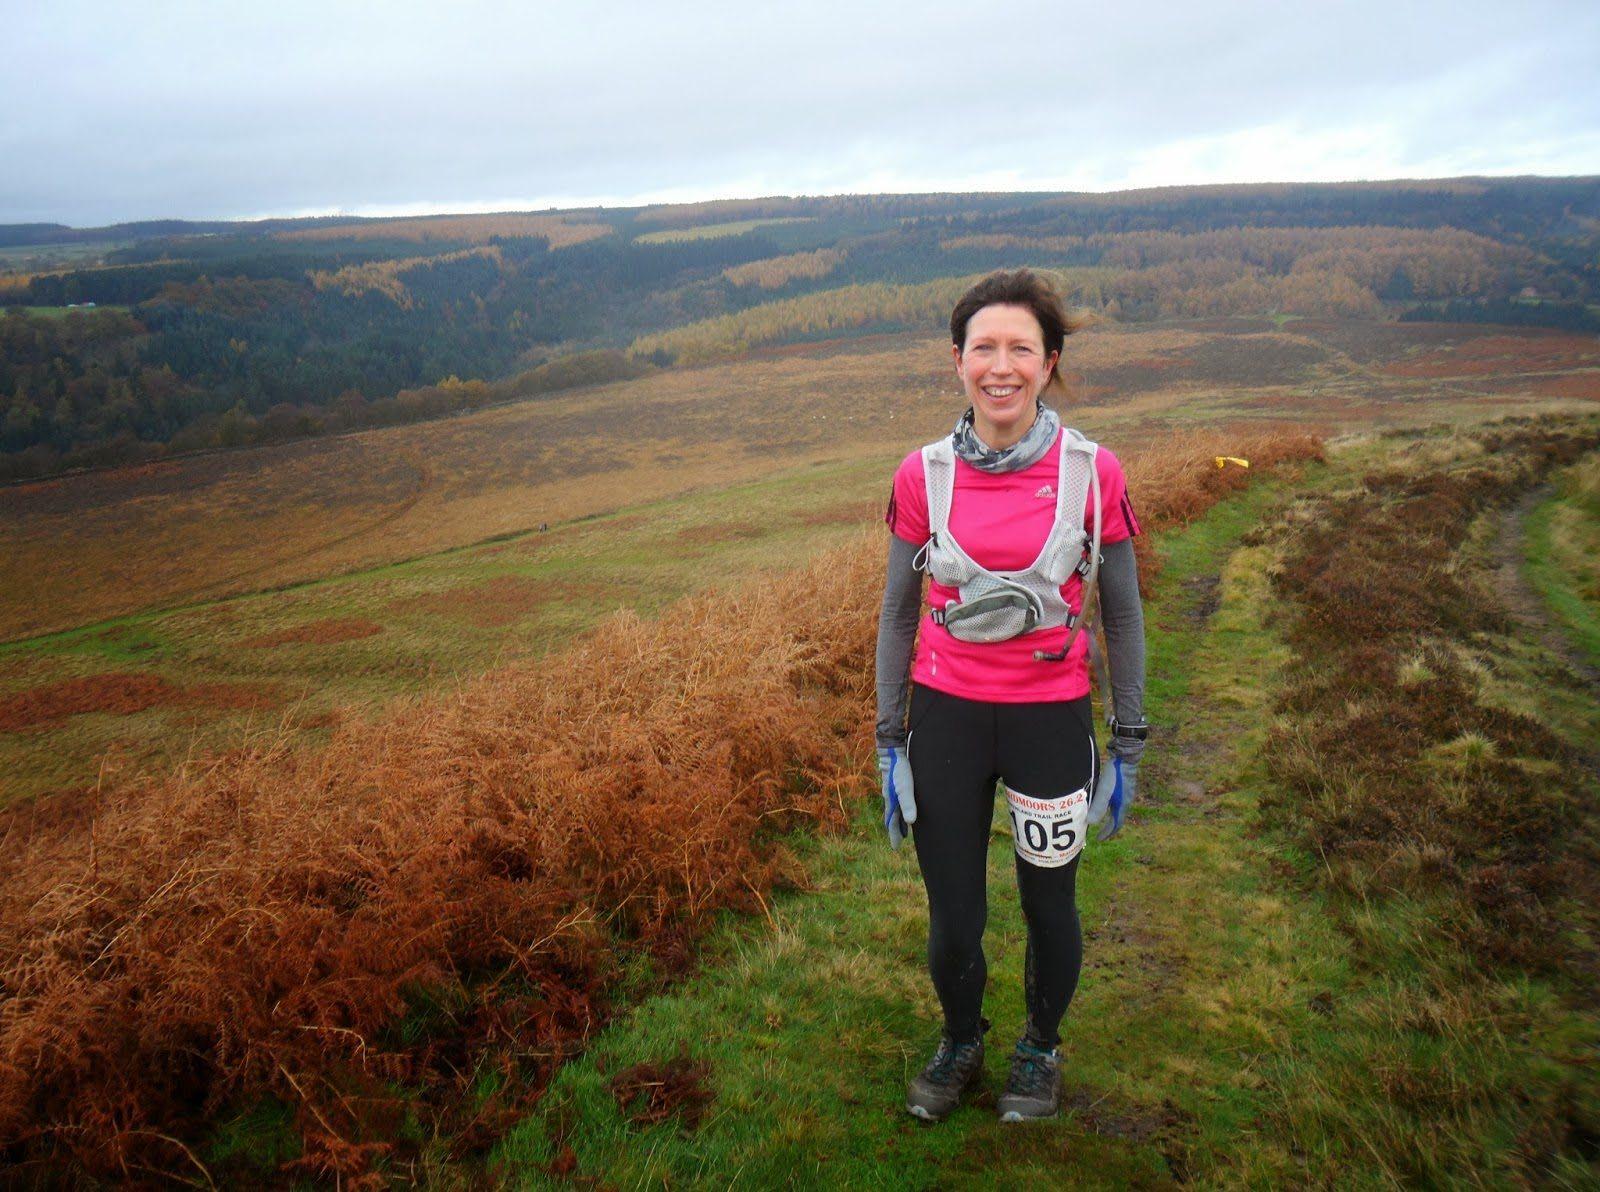 Hardmoors 26.2 Trail Marathon Series – Goathland